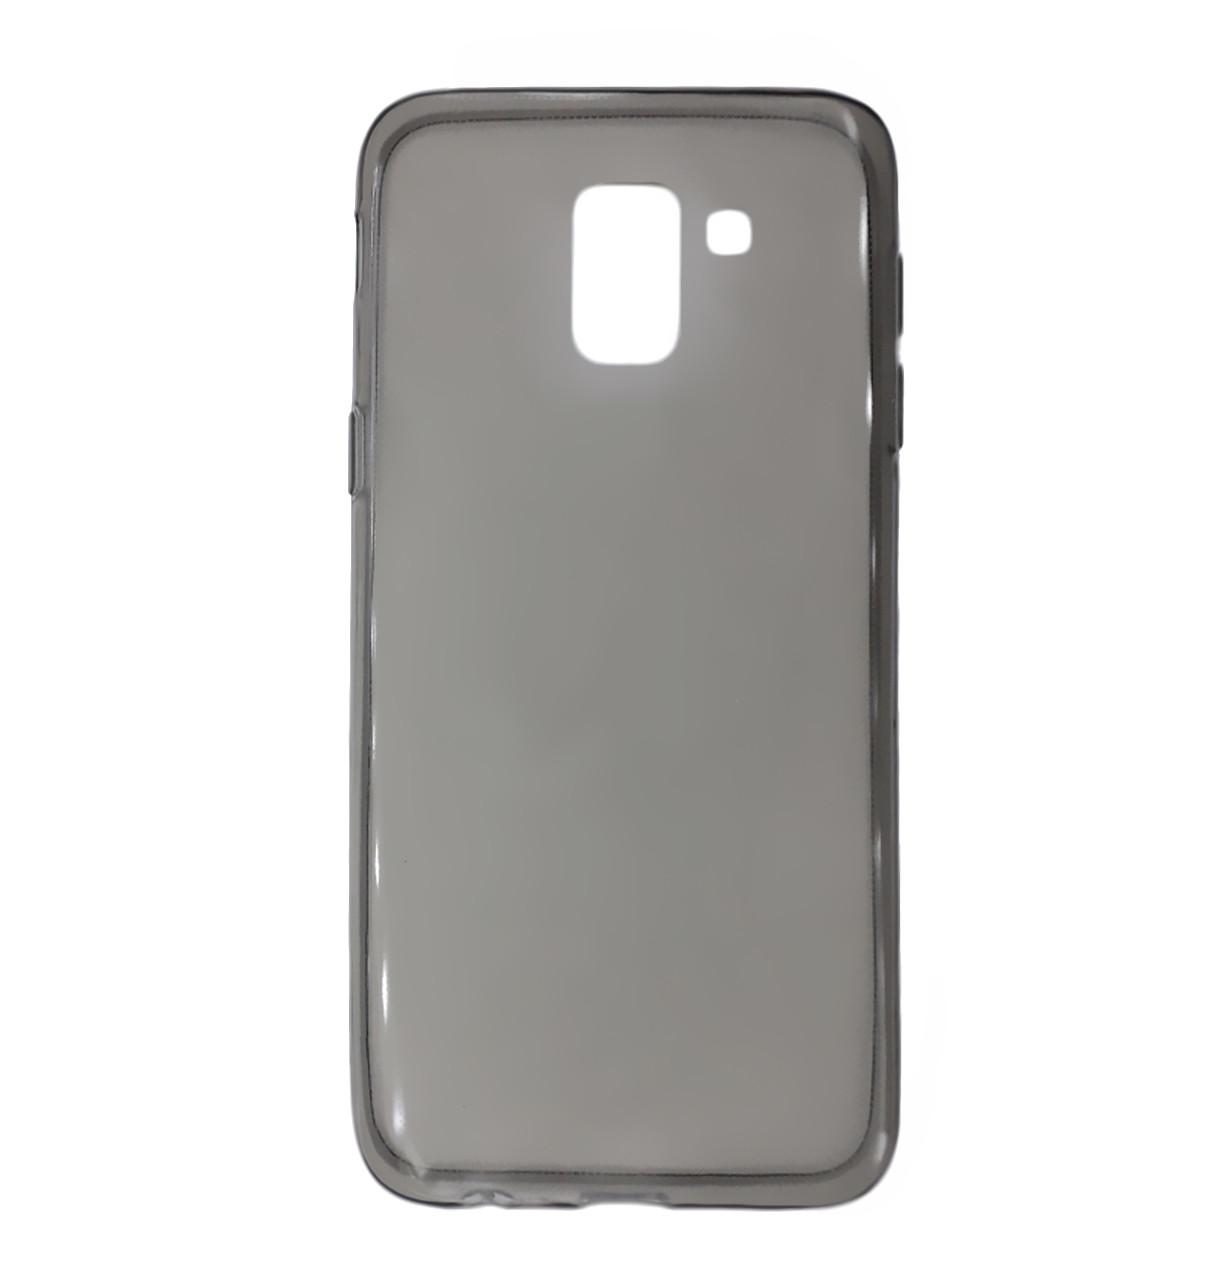 Силиконовая накладка Ultra-thin на Samsung Galaxy J6 (2018) SM-J600F Transparent Black